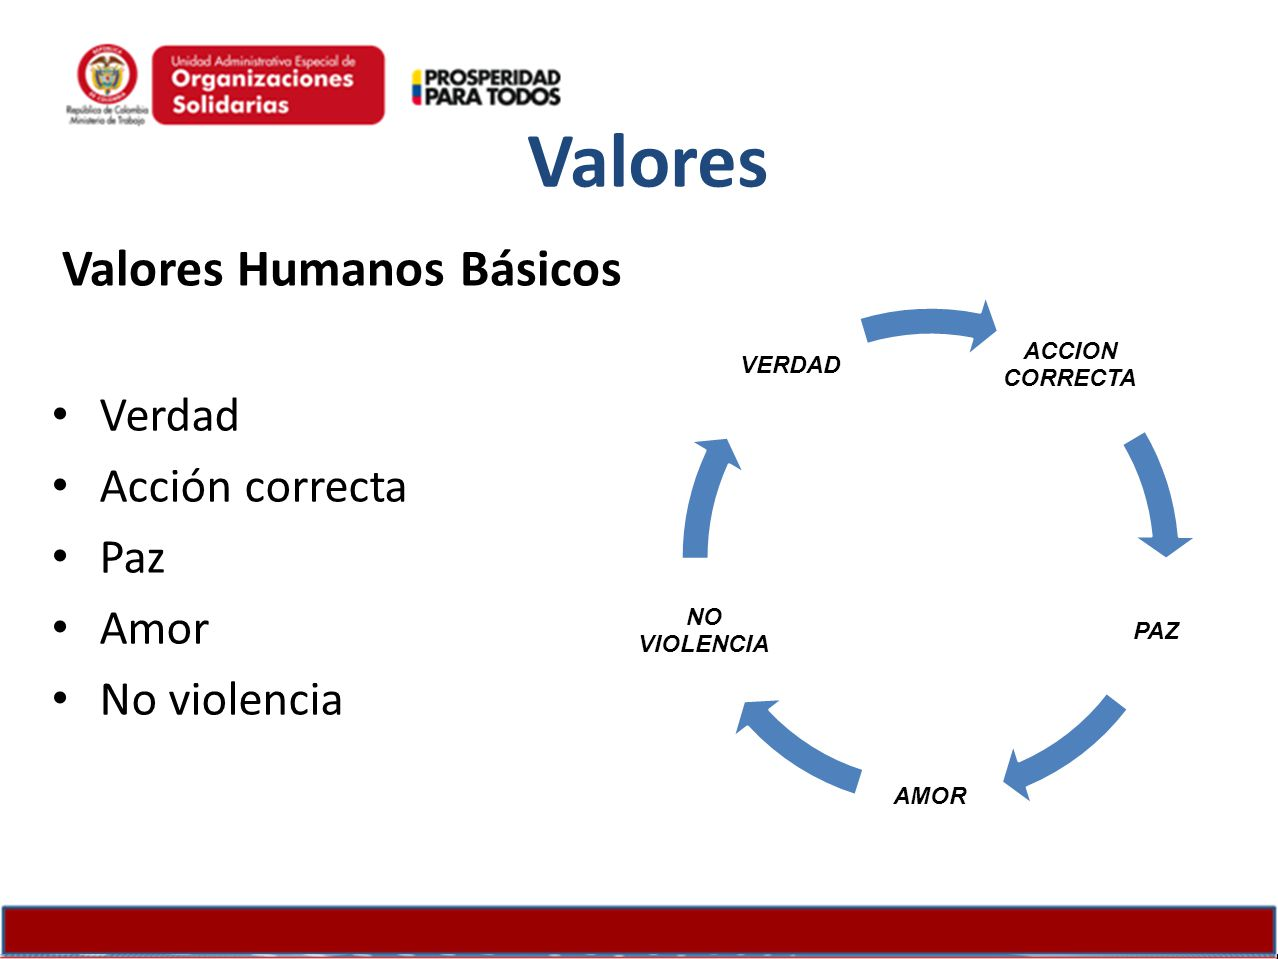 Valores Humanos Básicos